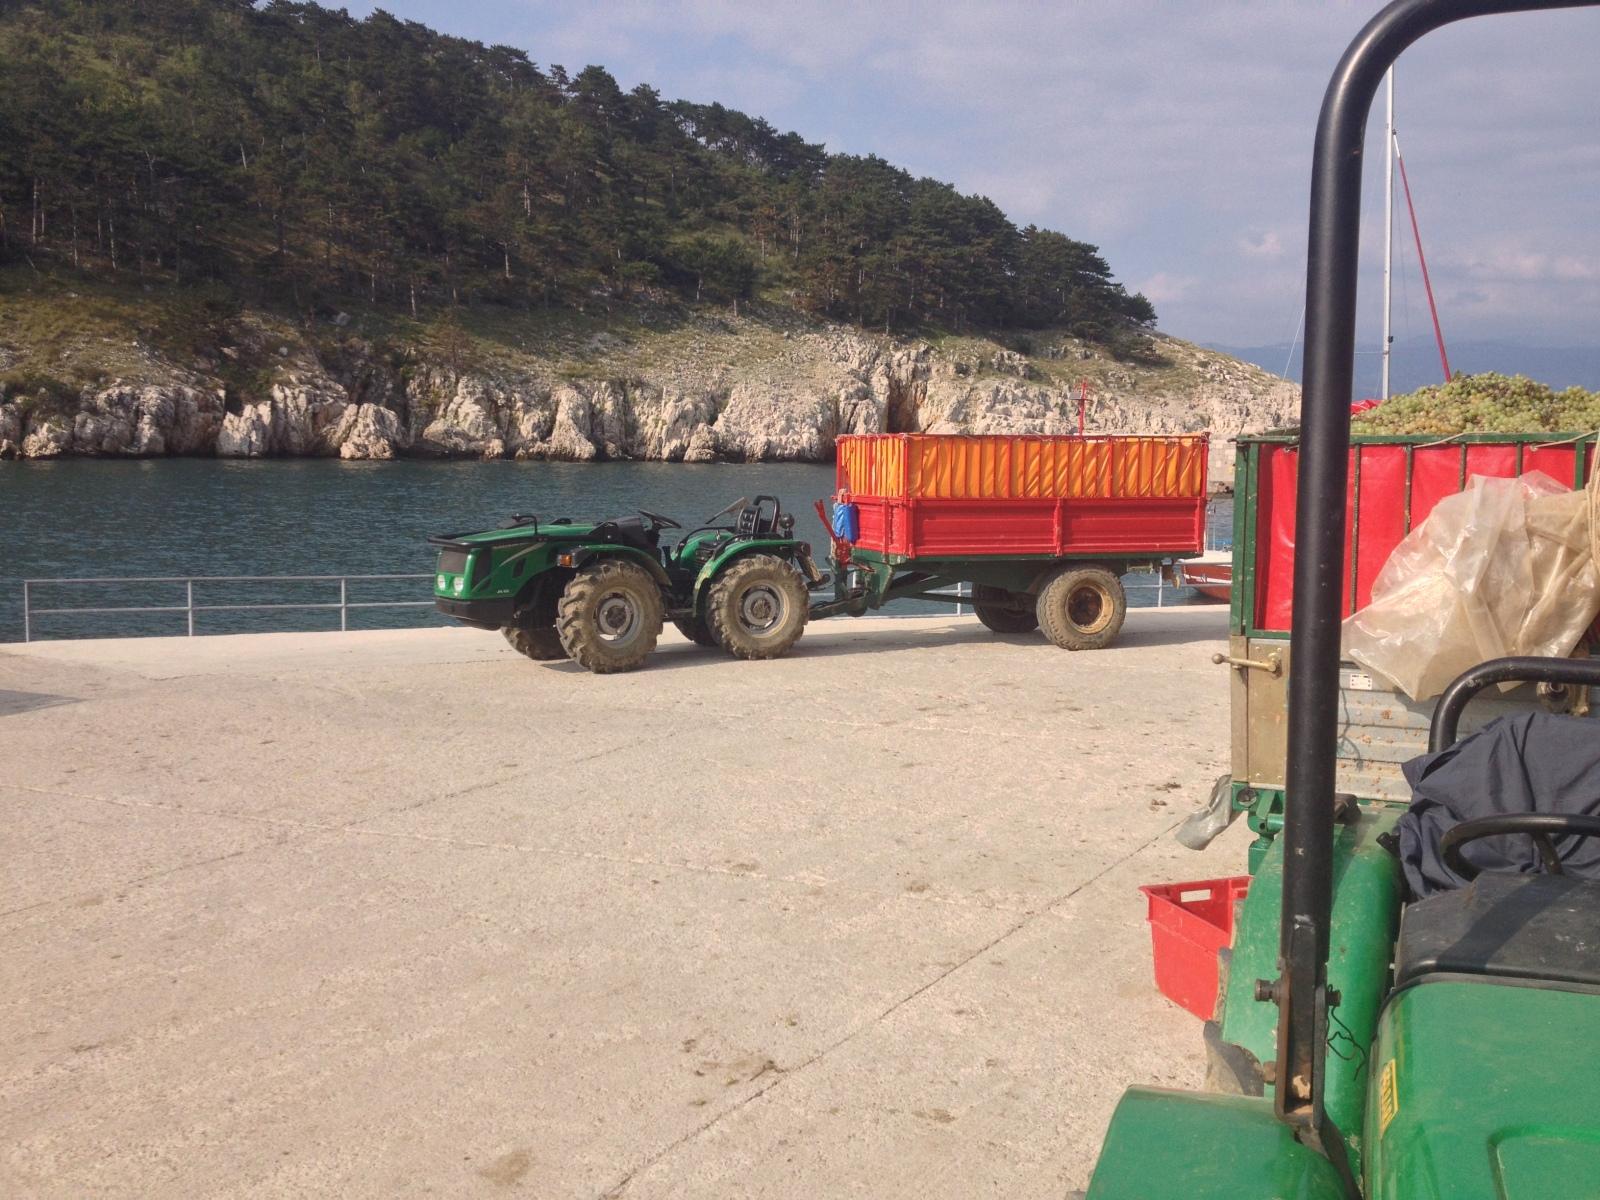 Traktori Ferrari opća tema traktora - Page 2 2e4xno9